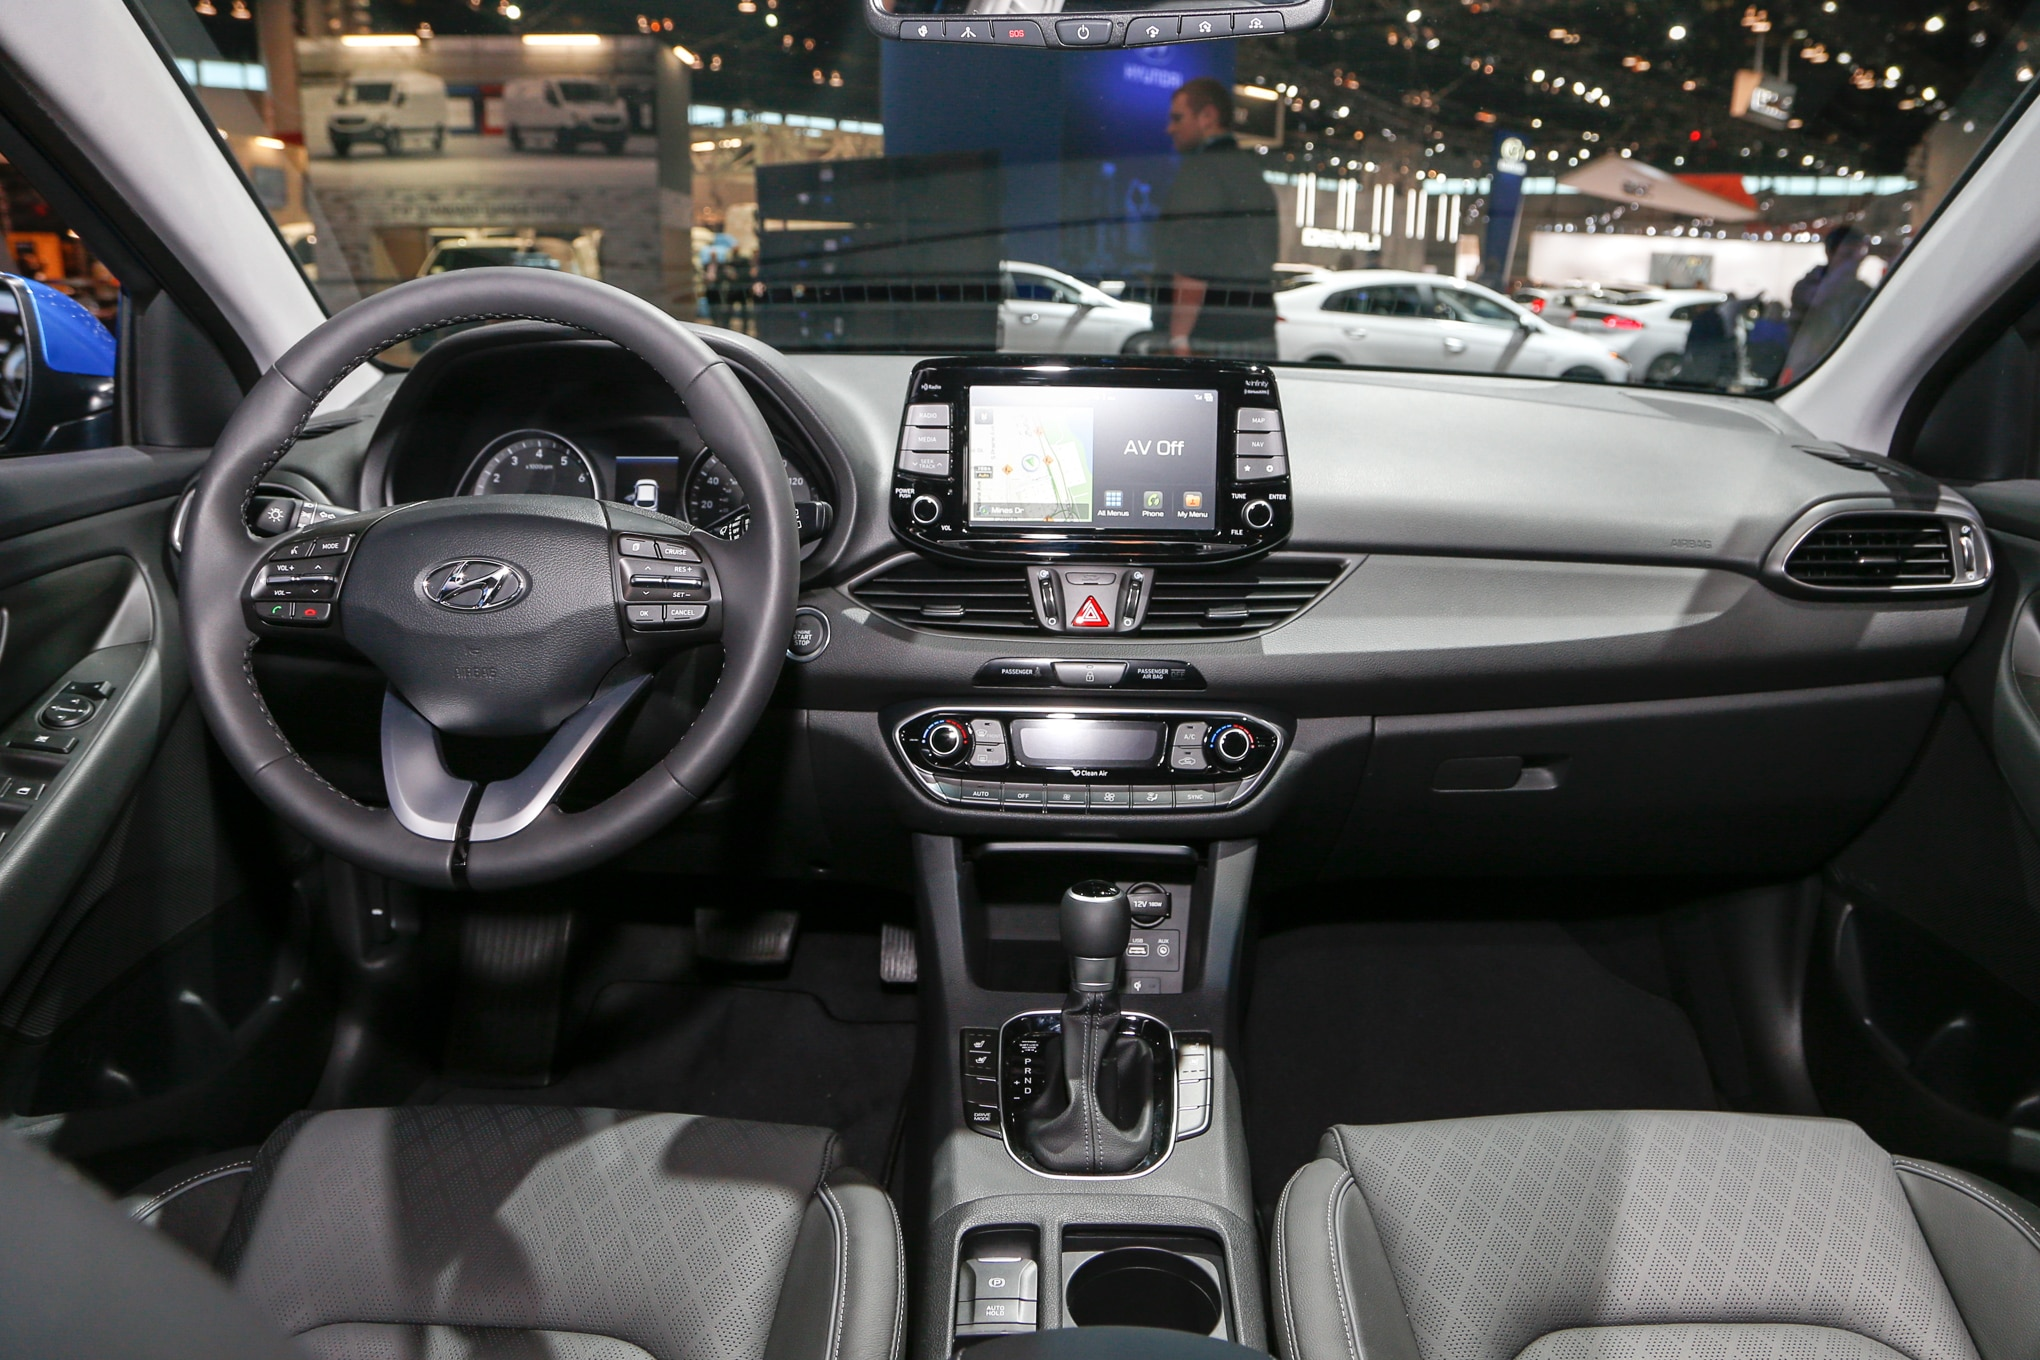 2018-Hyundai-Elantra-GT-hatchback-interior-view-2 - Motor ...